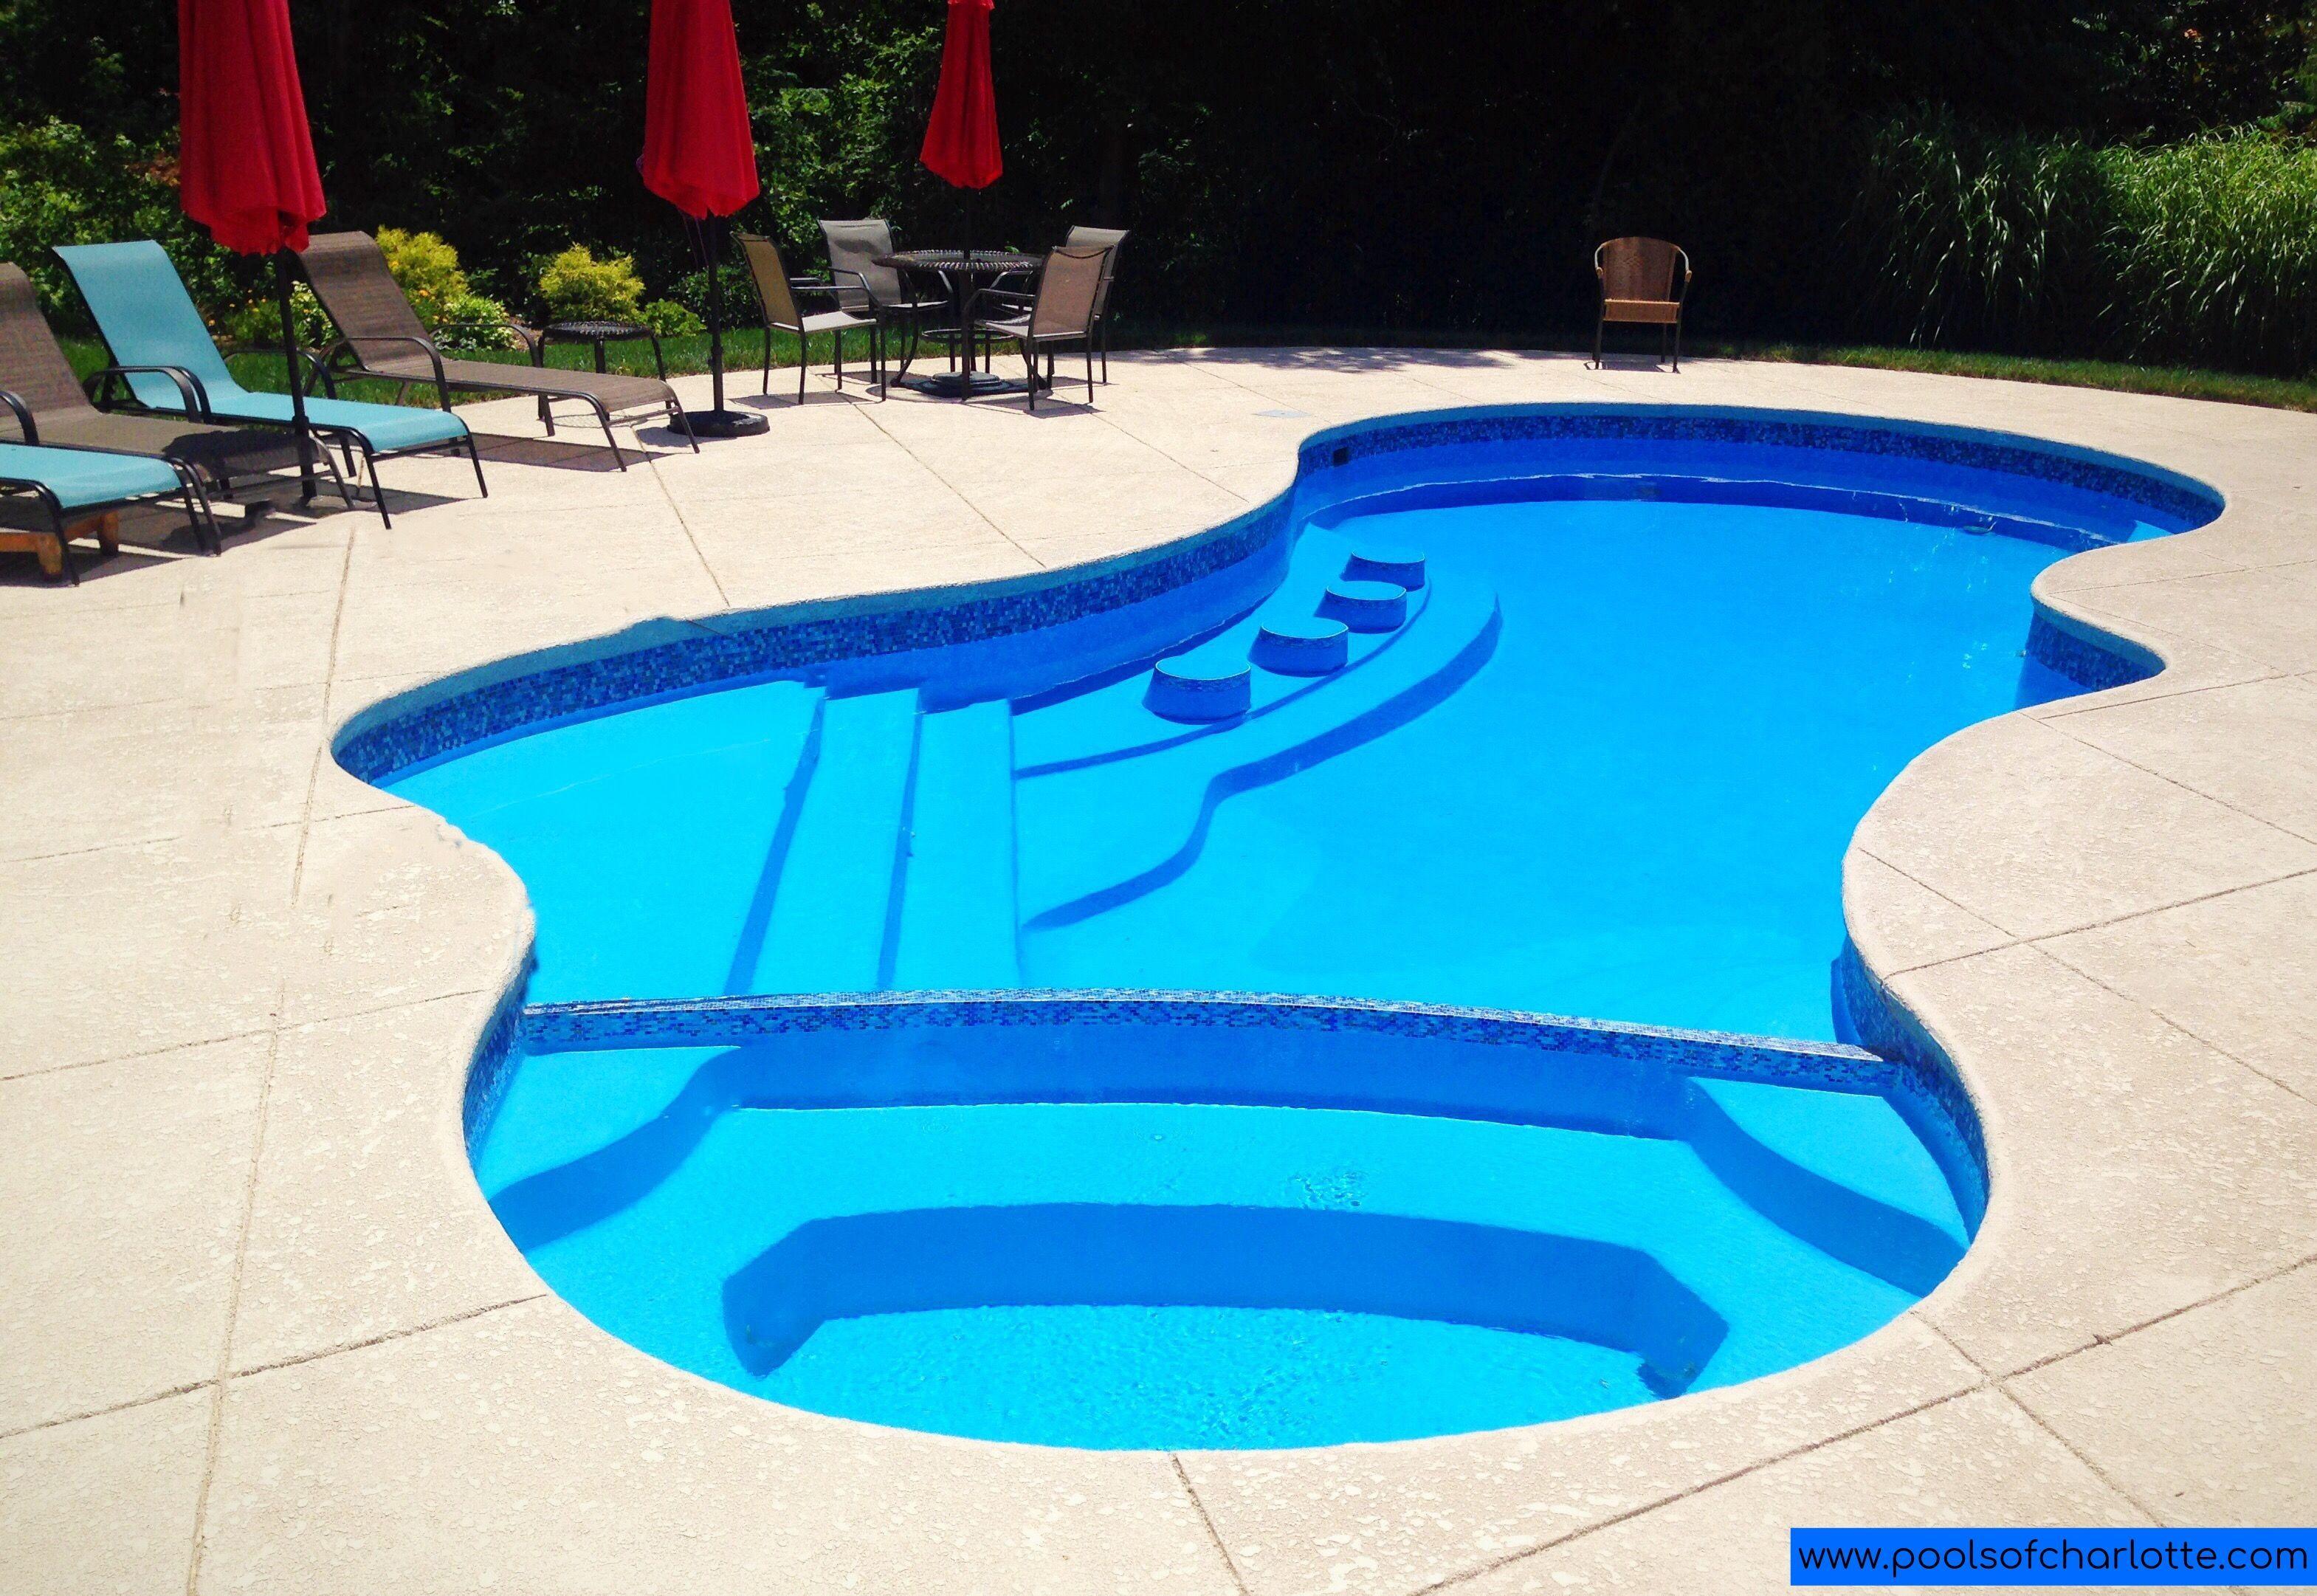 inground pool sizes - Google Search in 2020 | Fiberglass ...